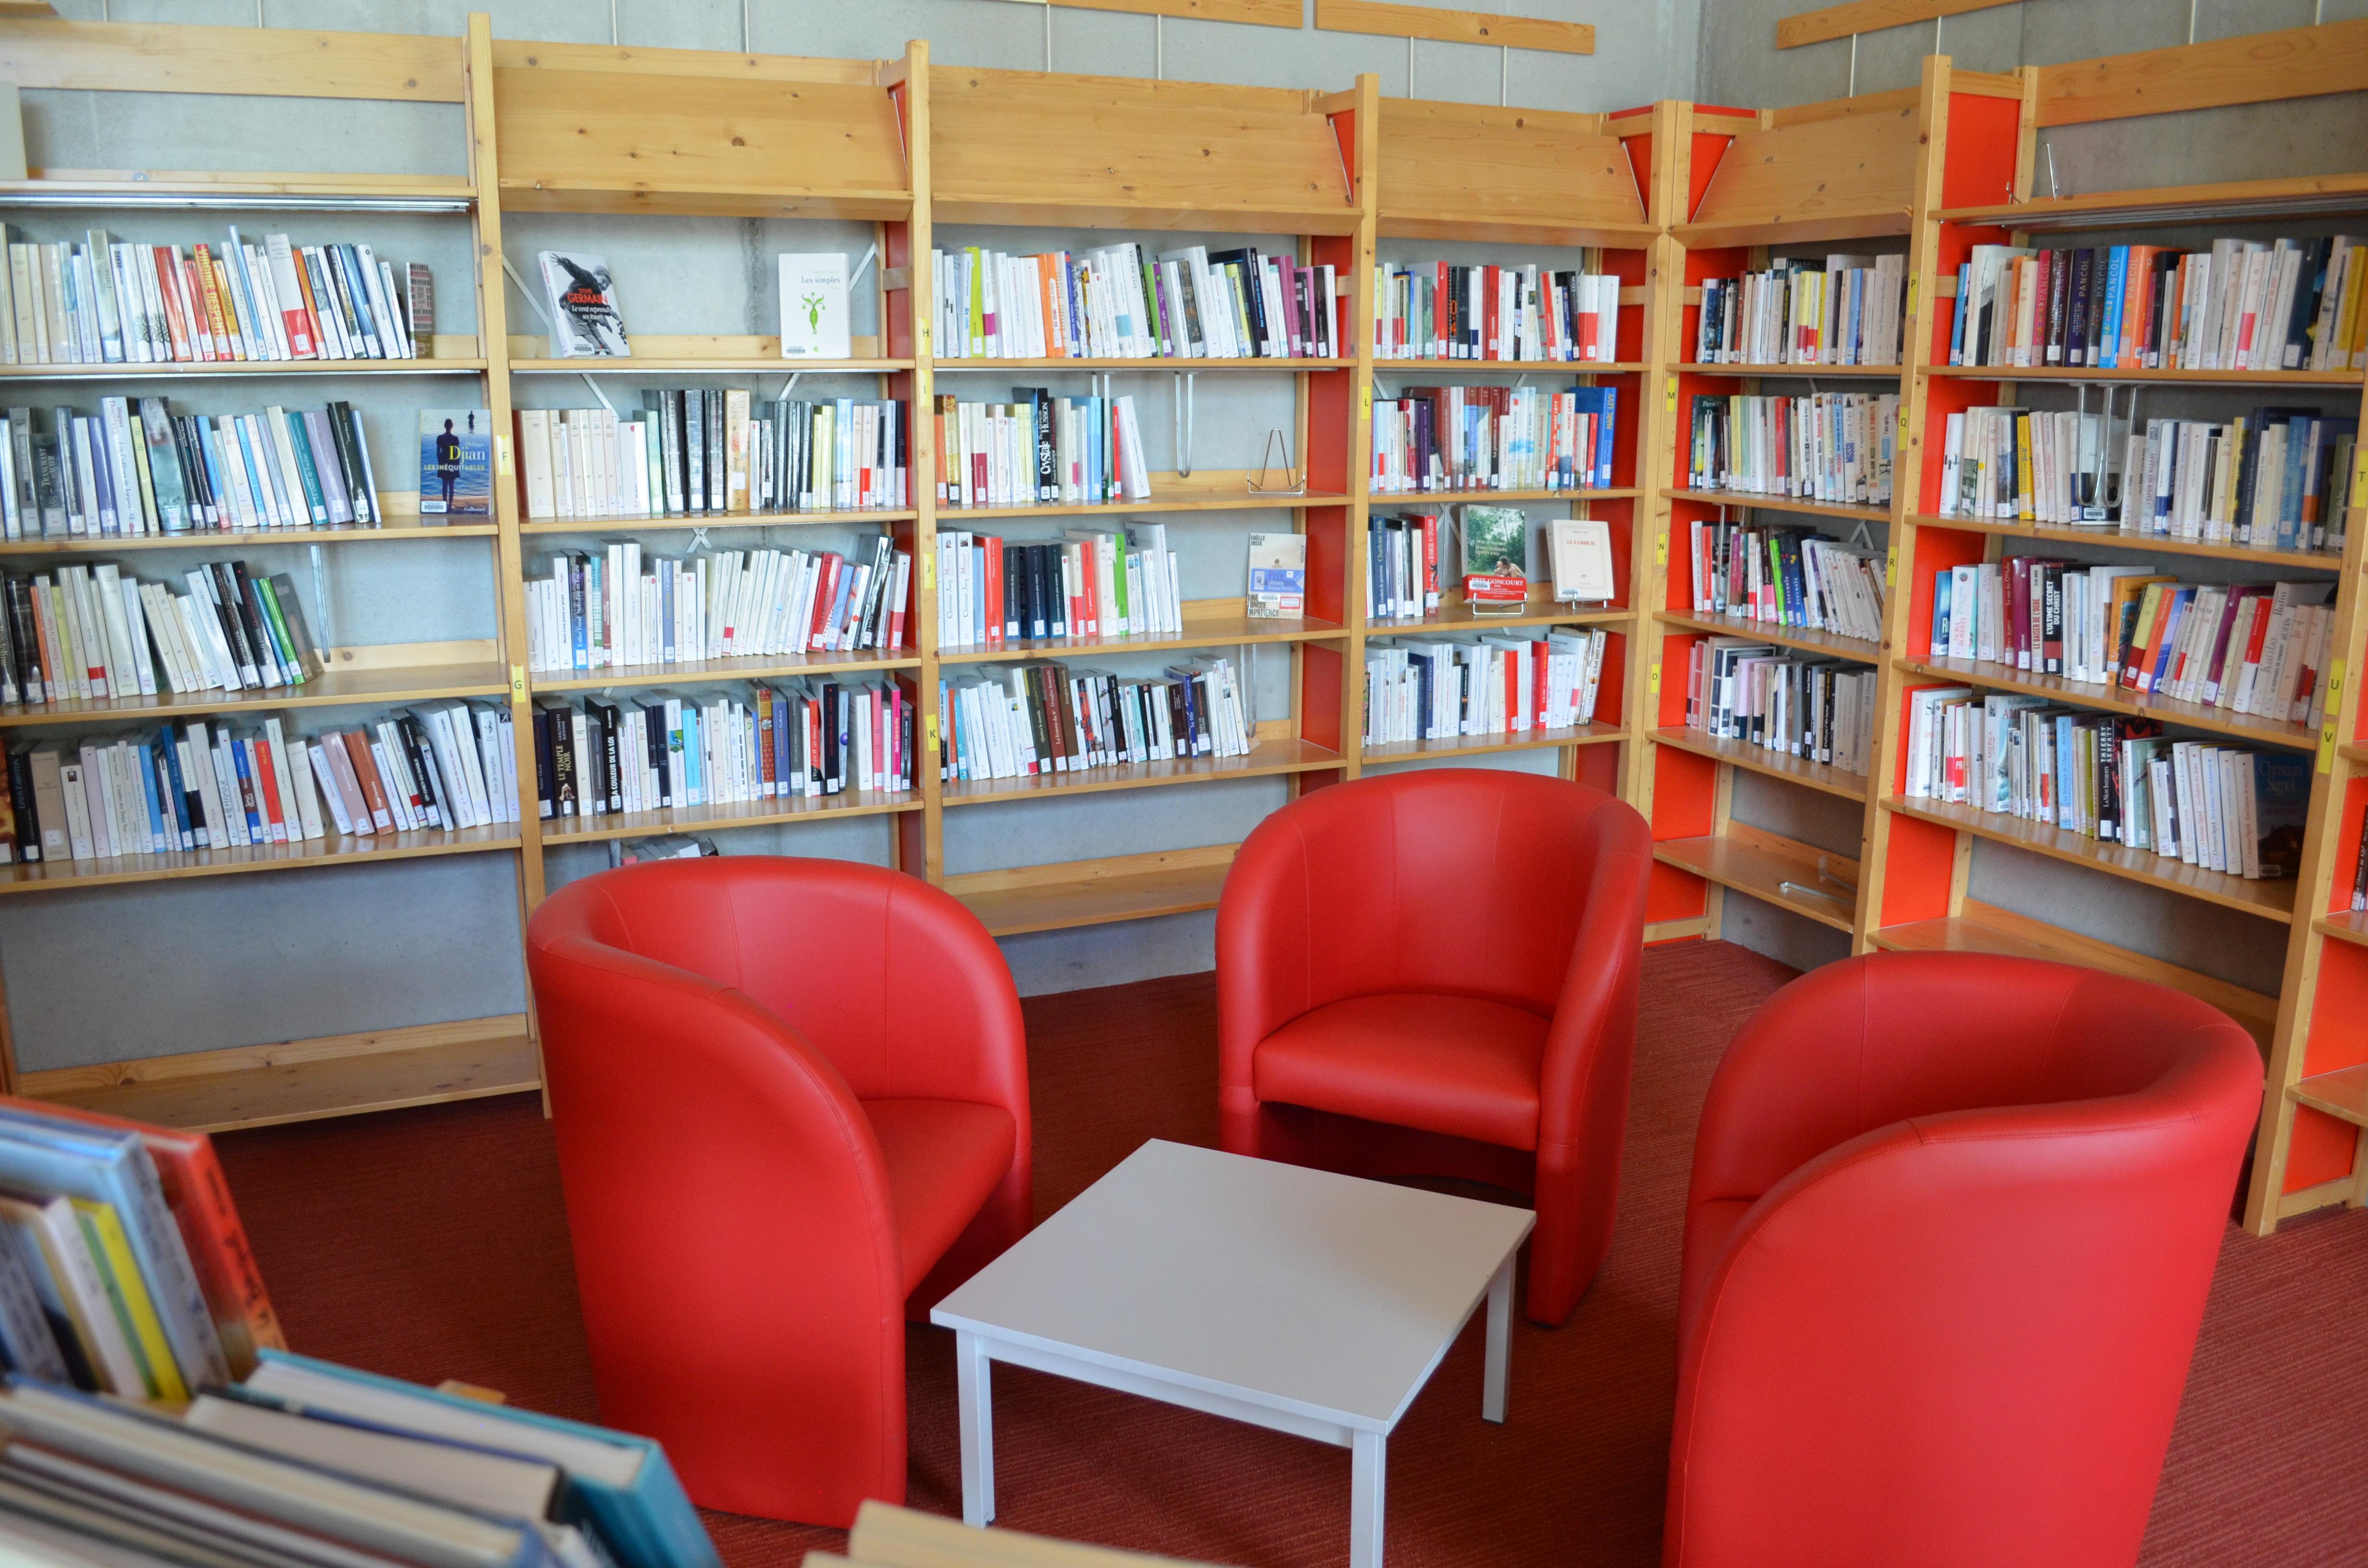 Bibliothèque fauteuil rouge.JPG